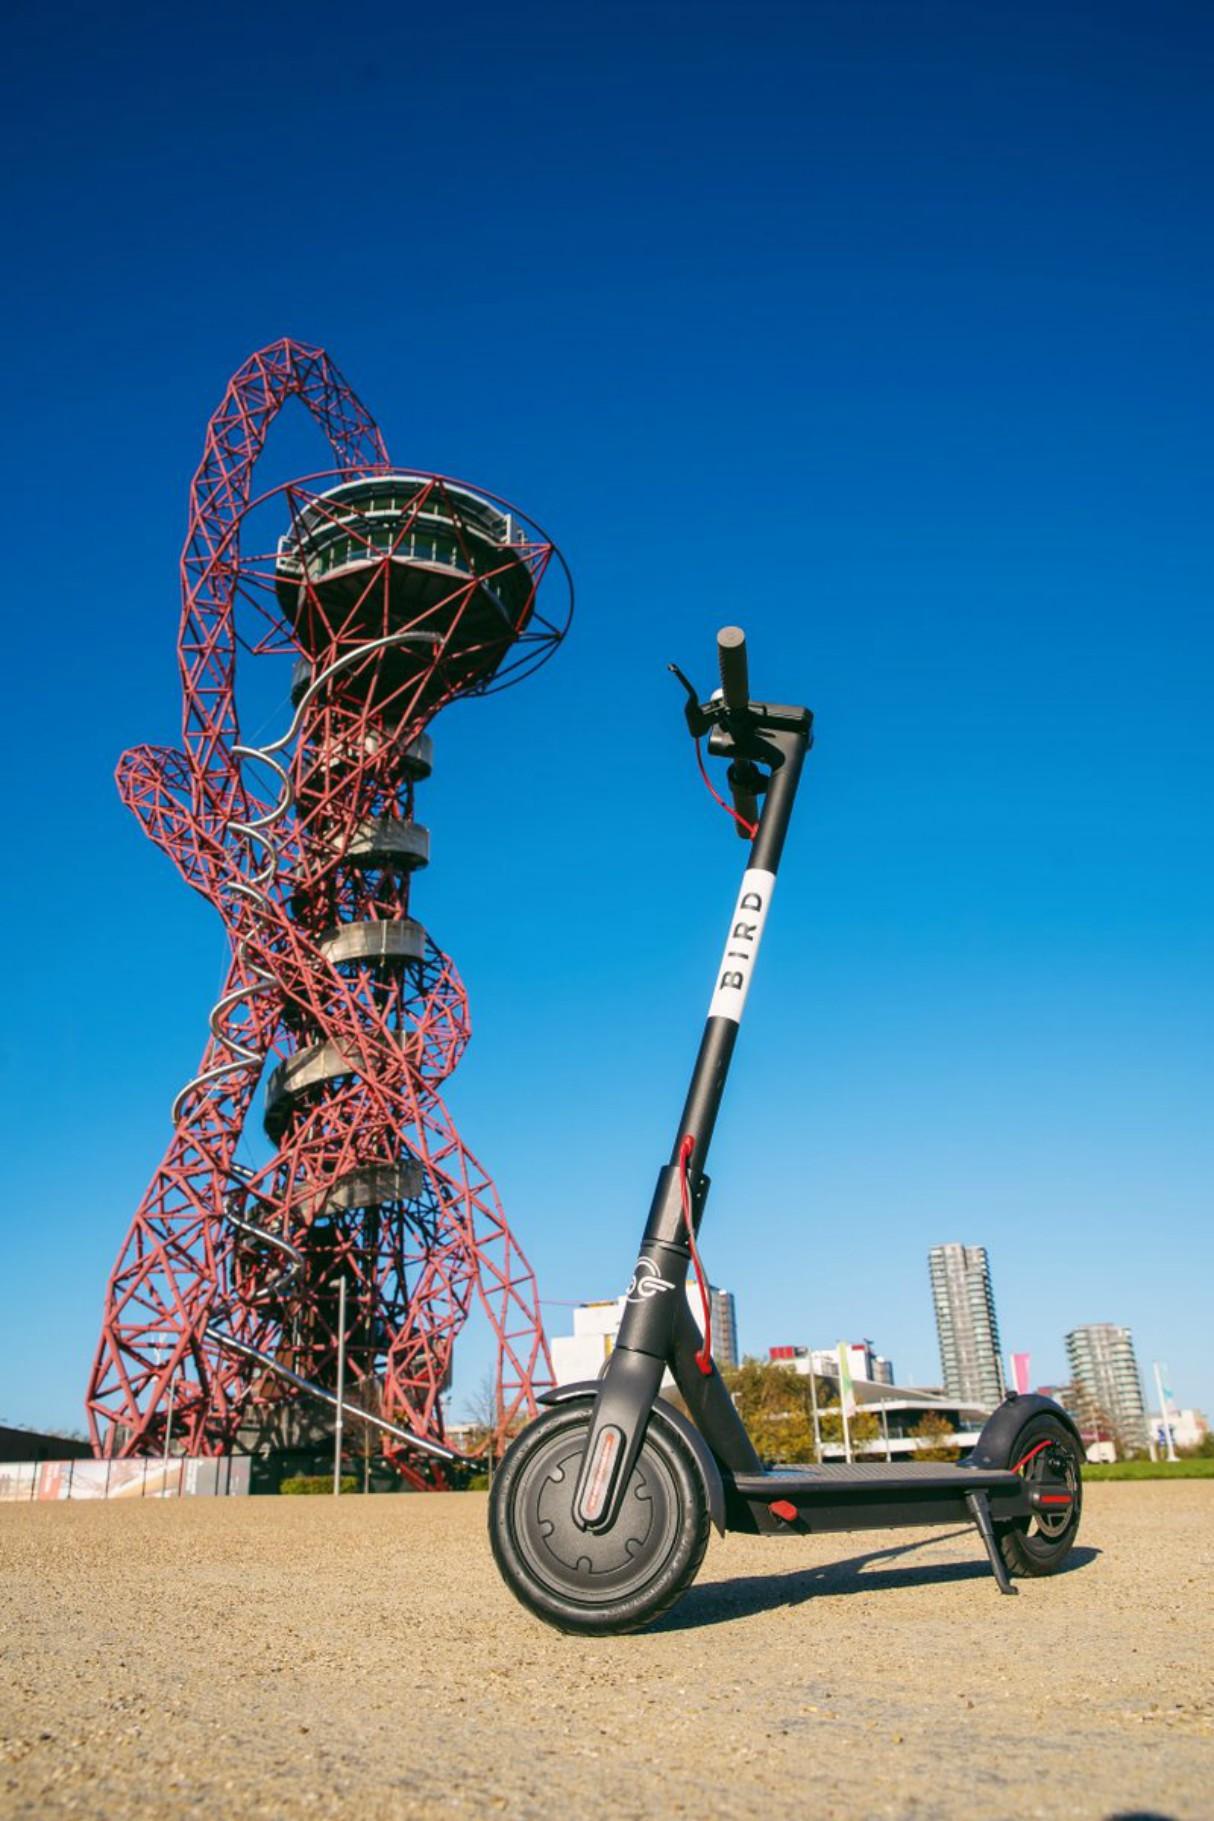 bird-scooter-share-london-stratford-2